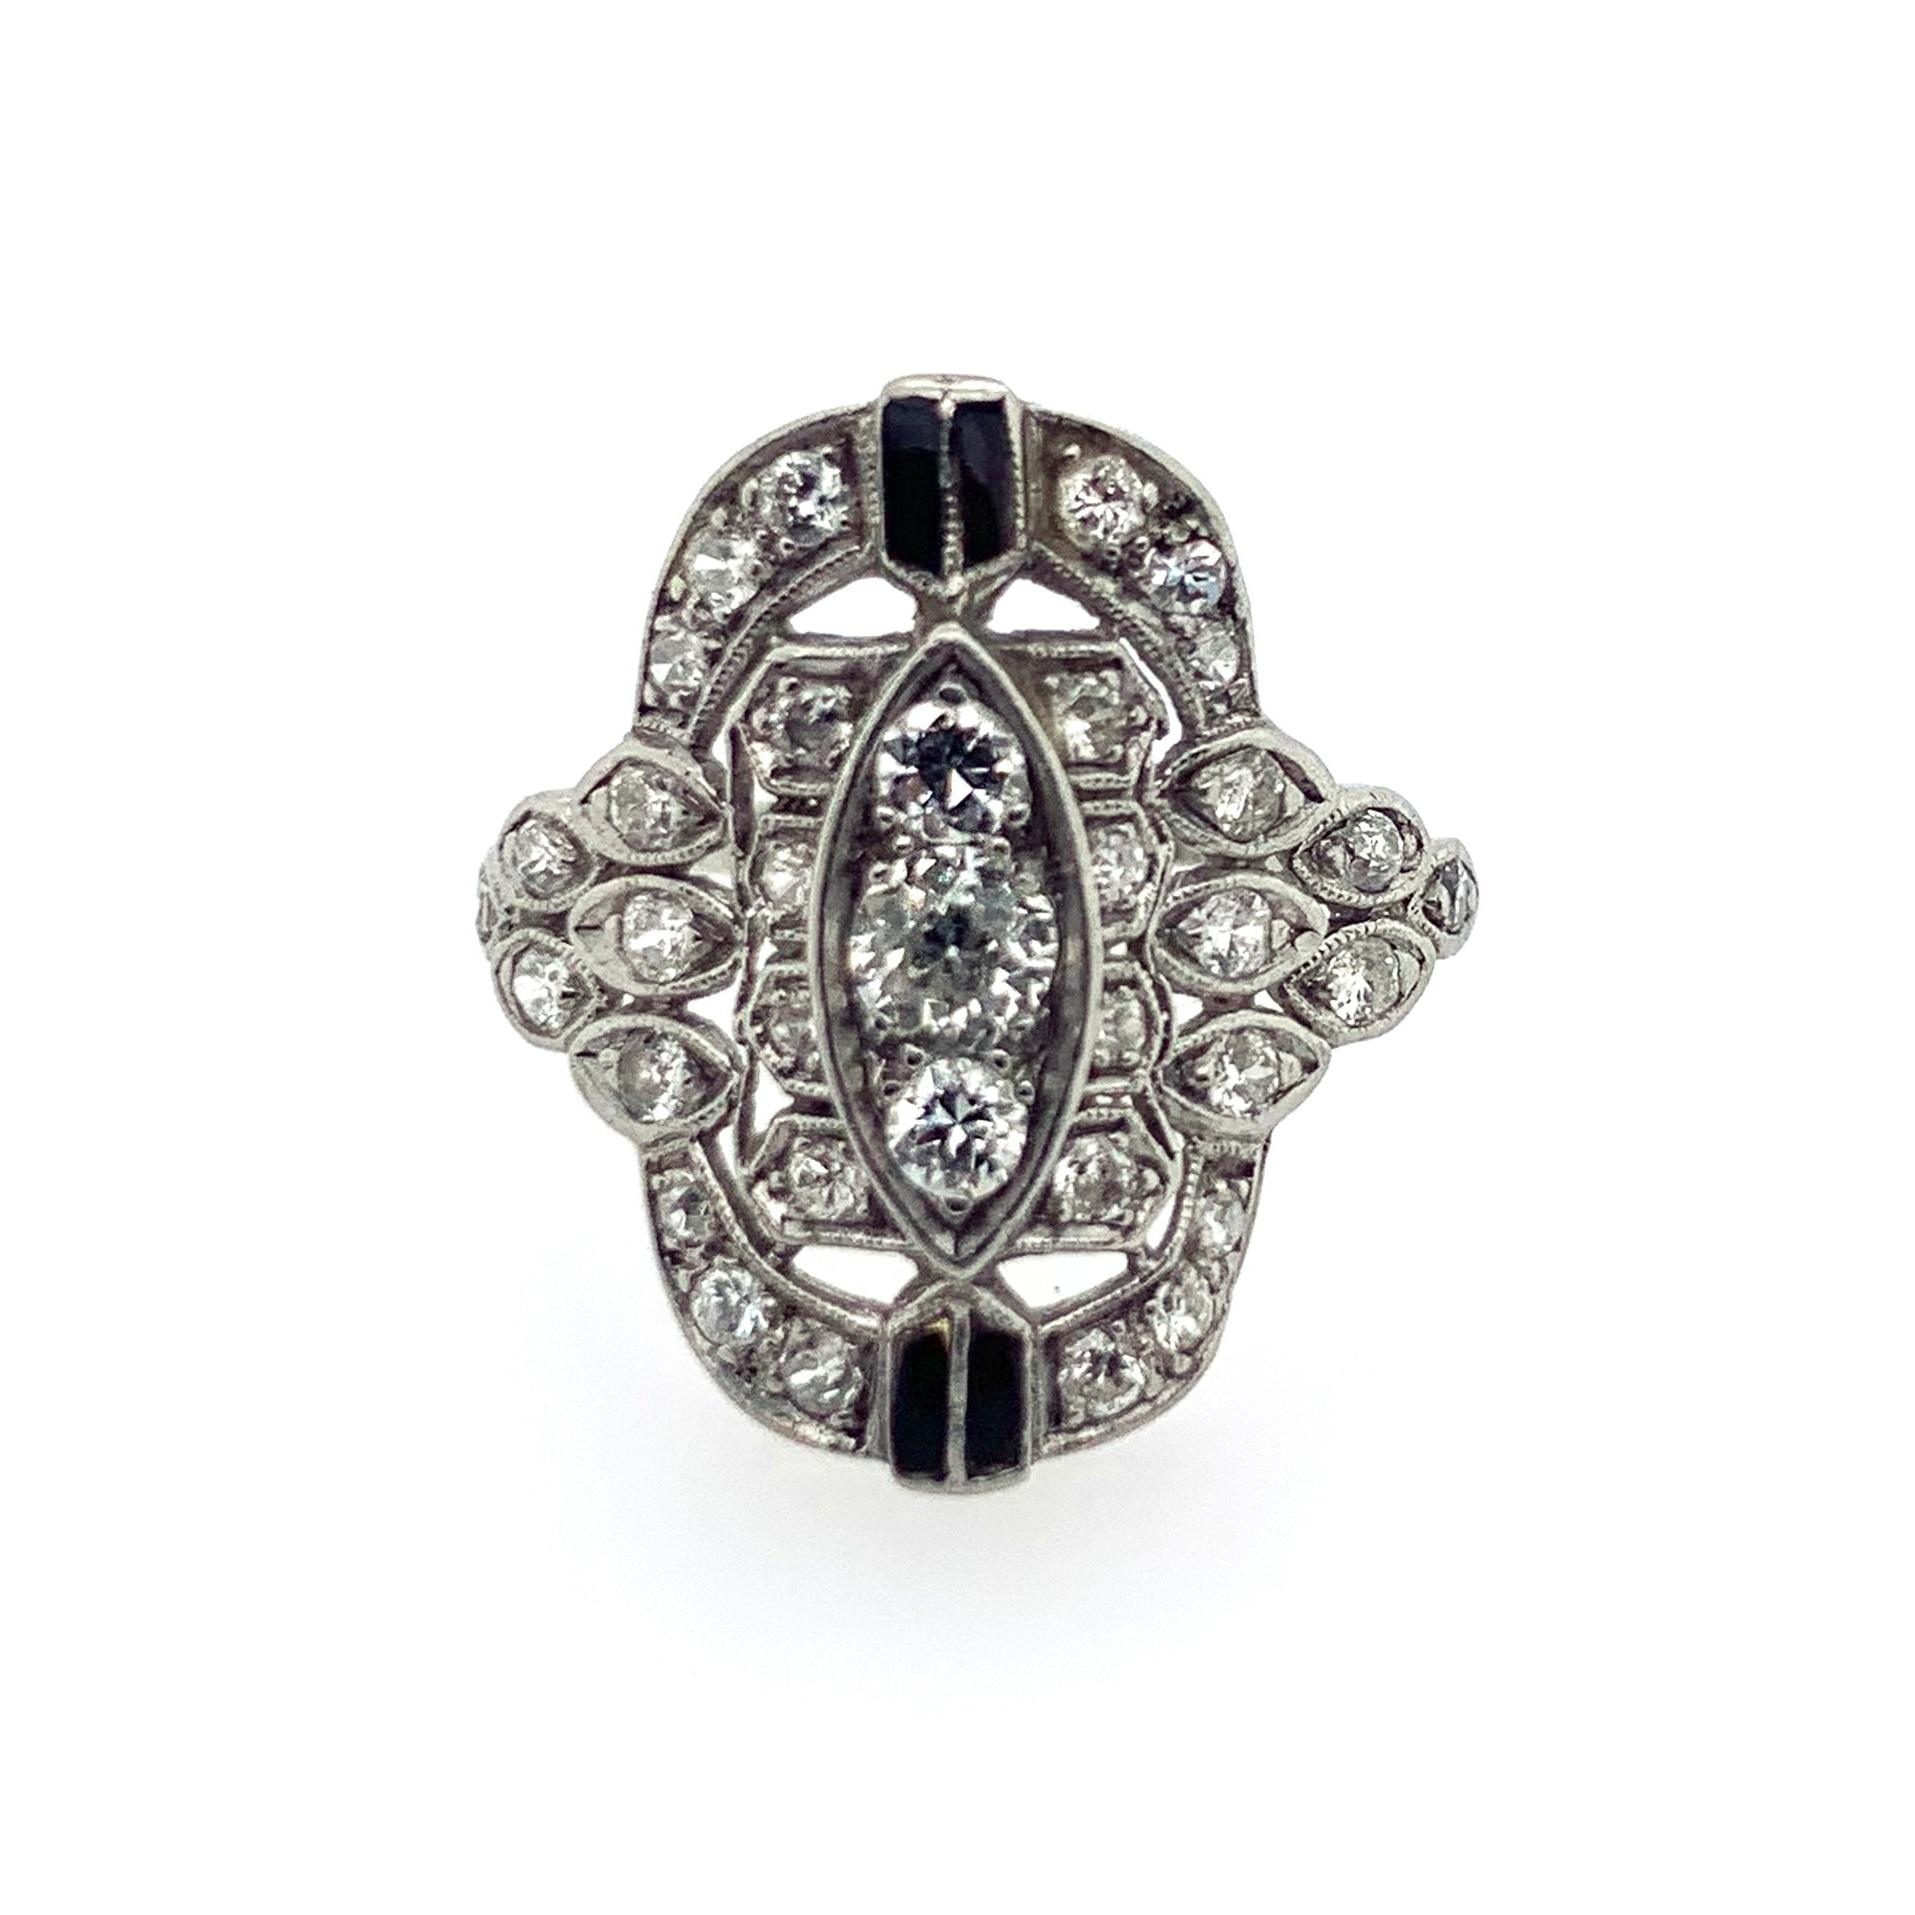 Art Nouveau Diamond Ring with Onyx